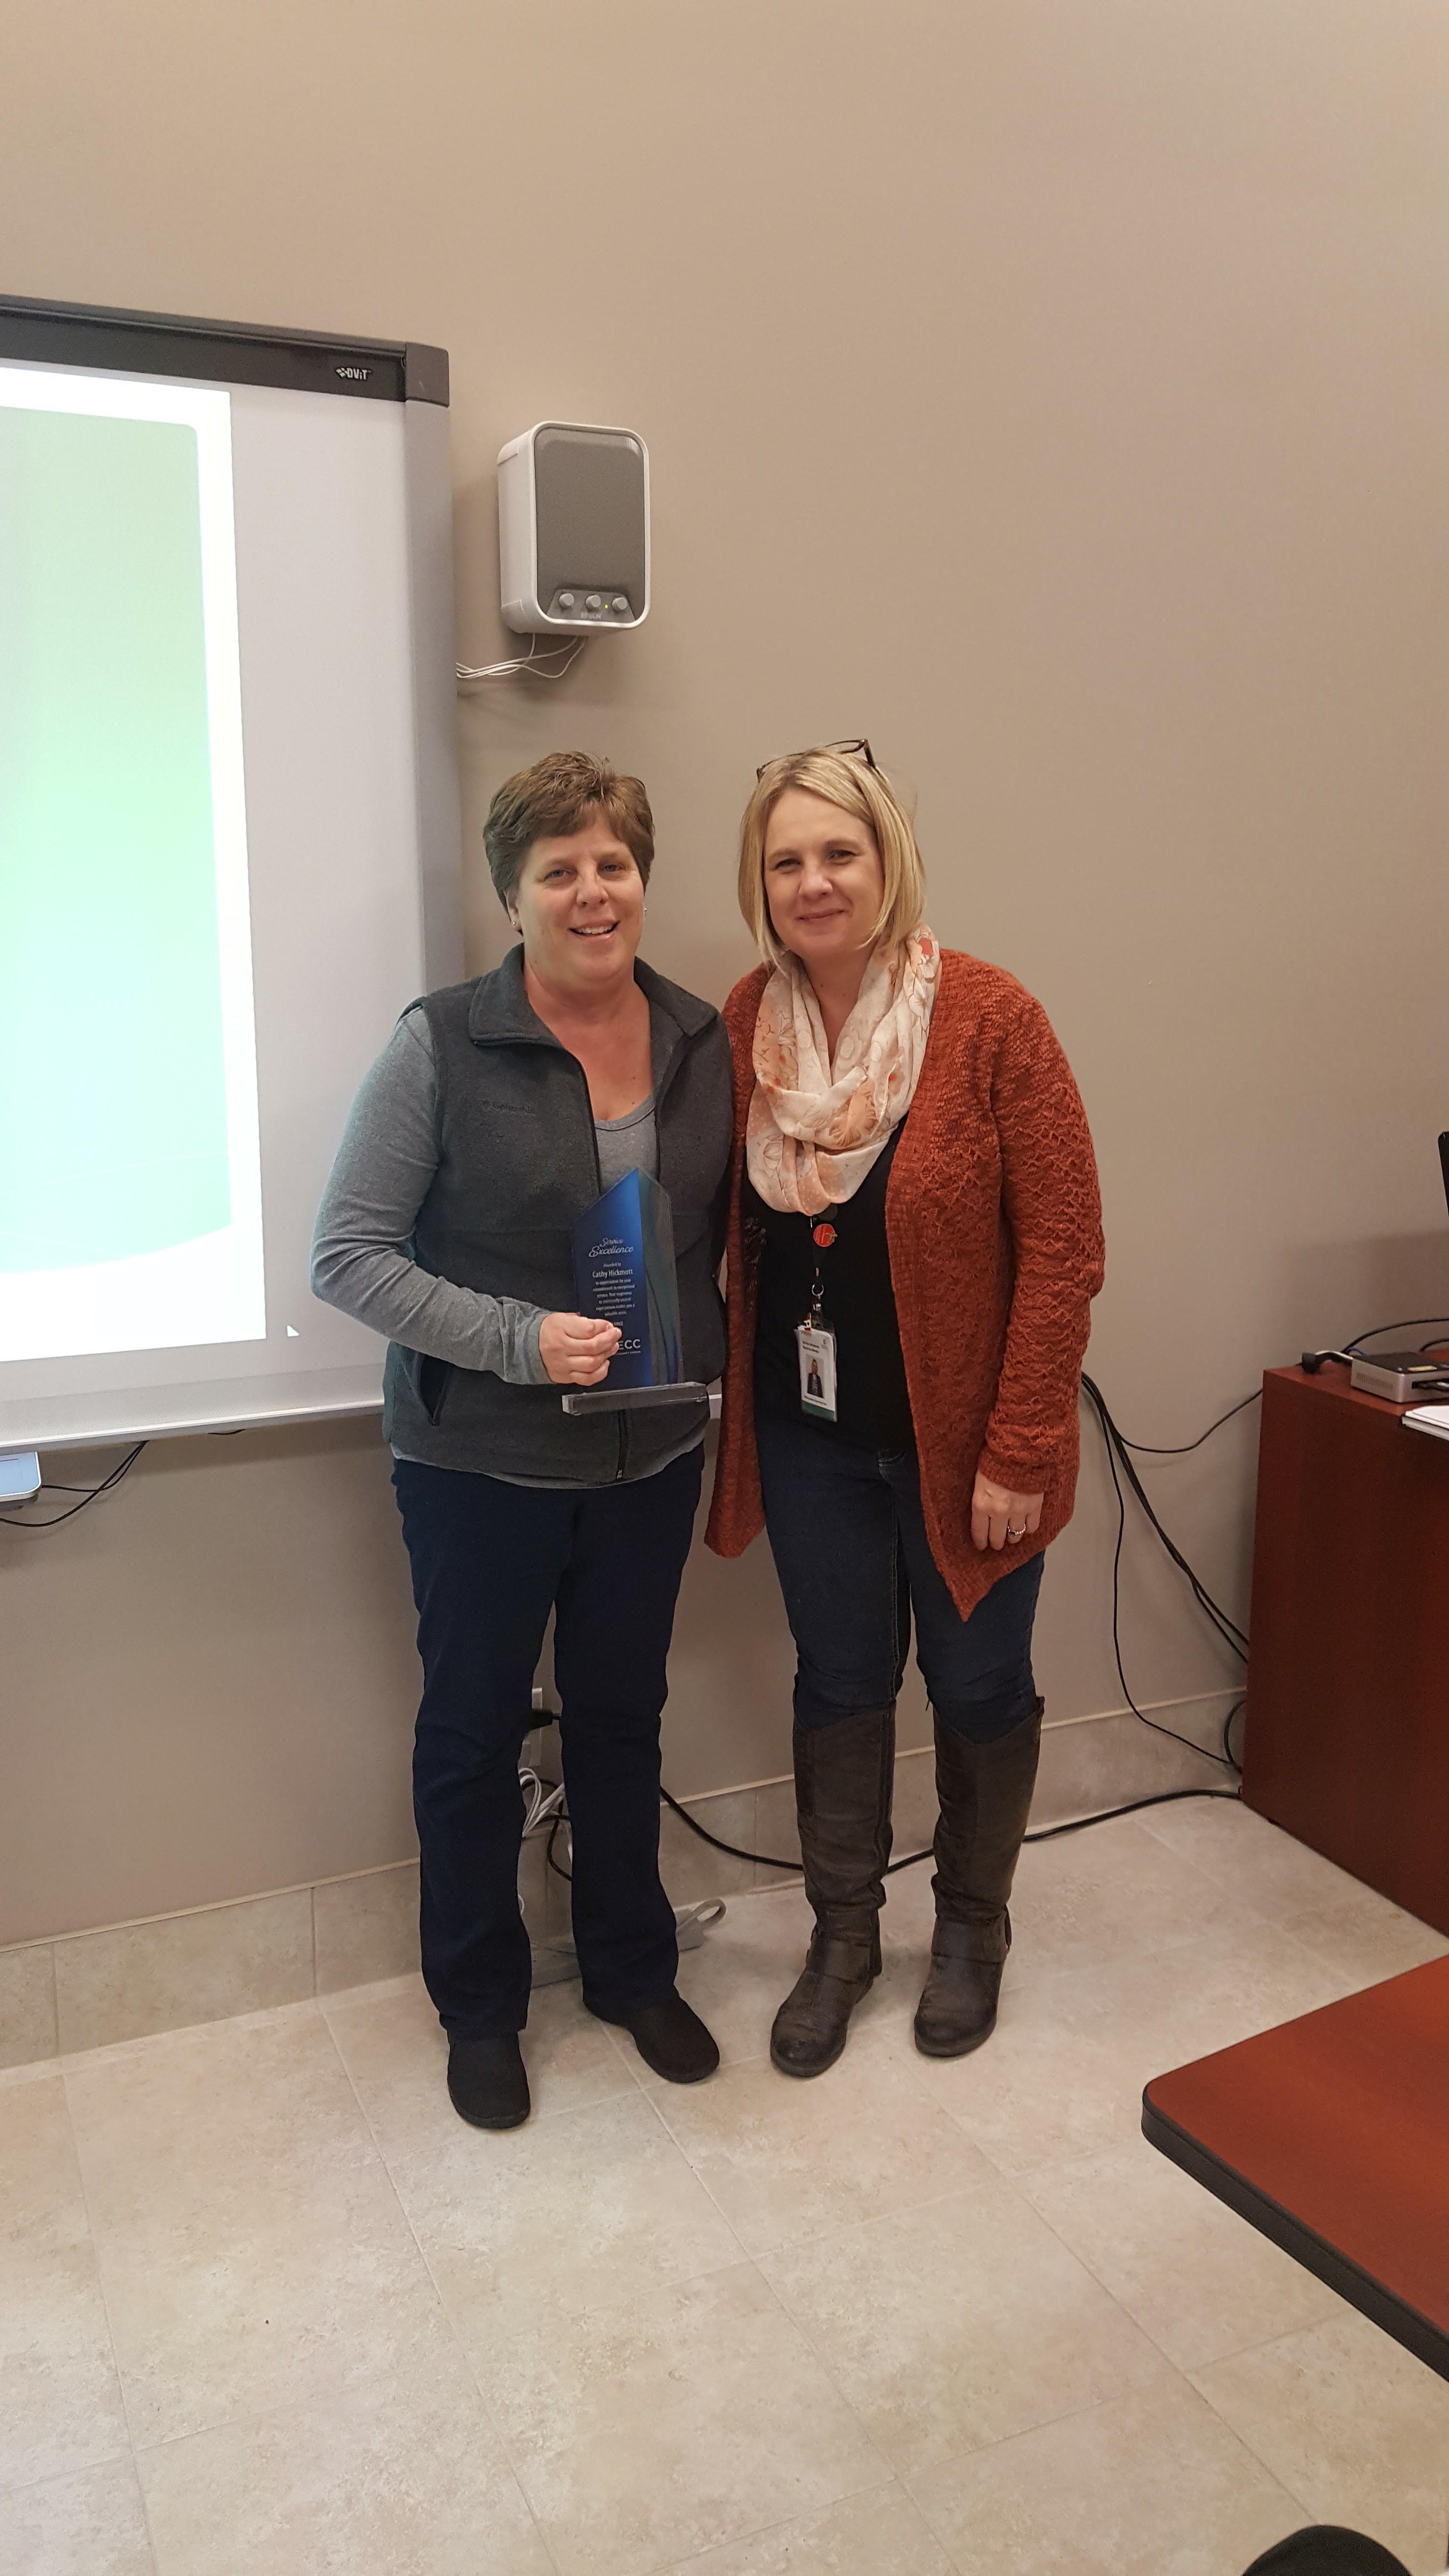 Kathy - Service Award